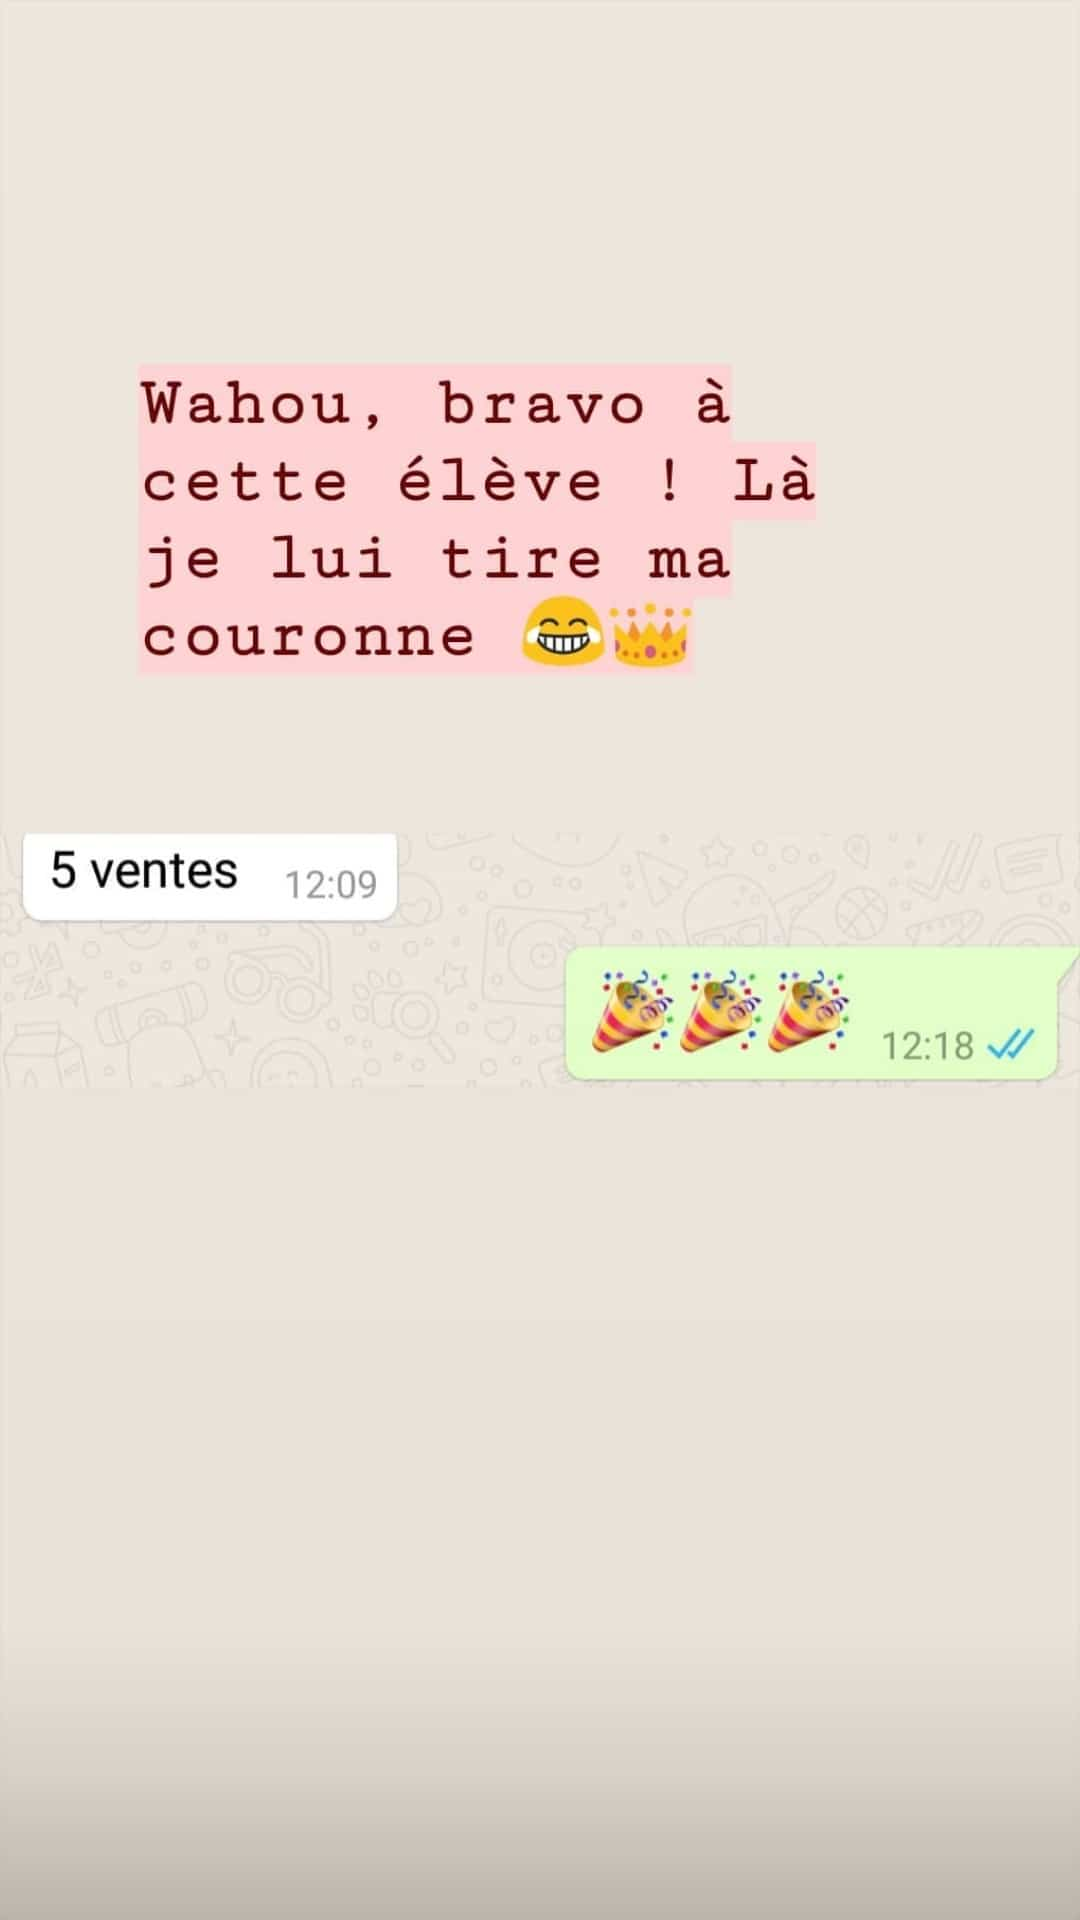 Avis-Les-Reines-Affiliation_20200605_084545